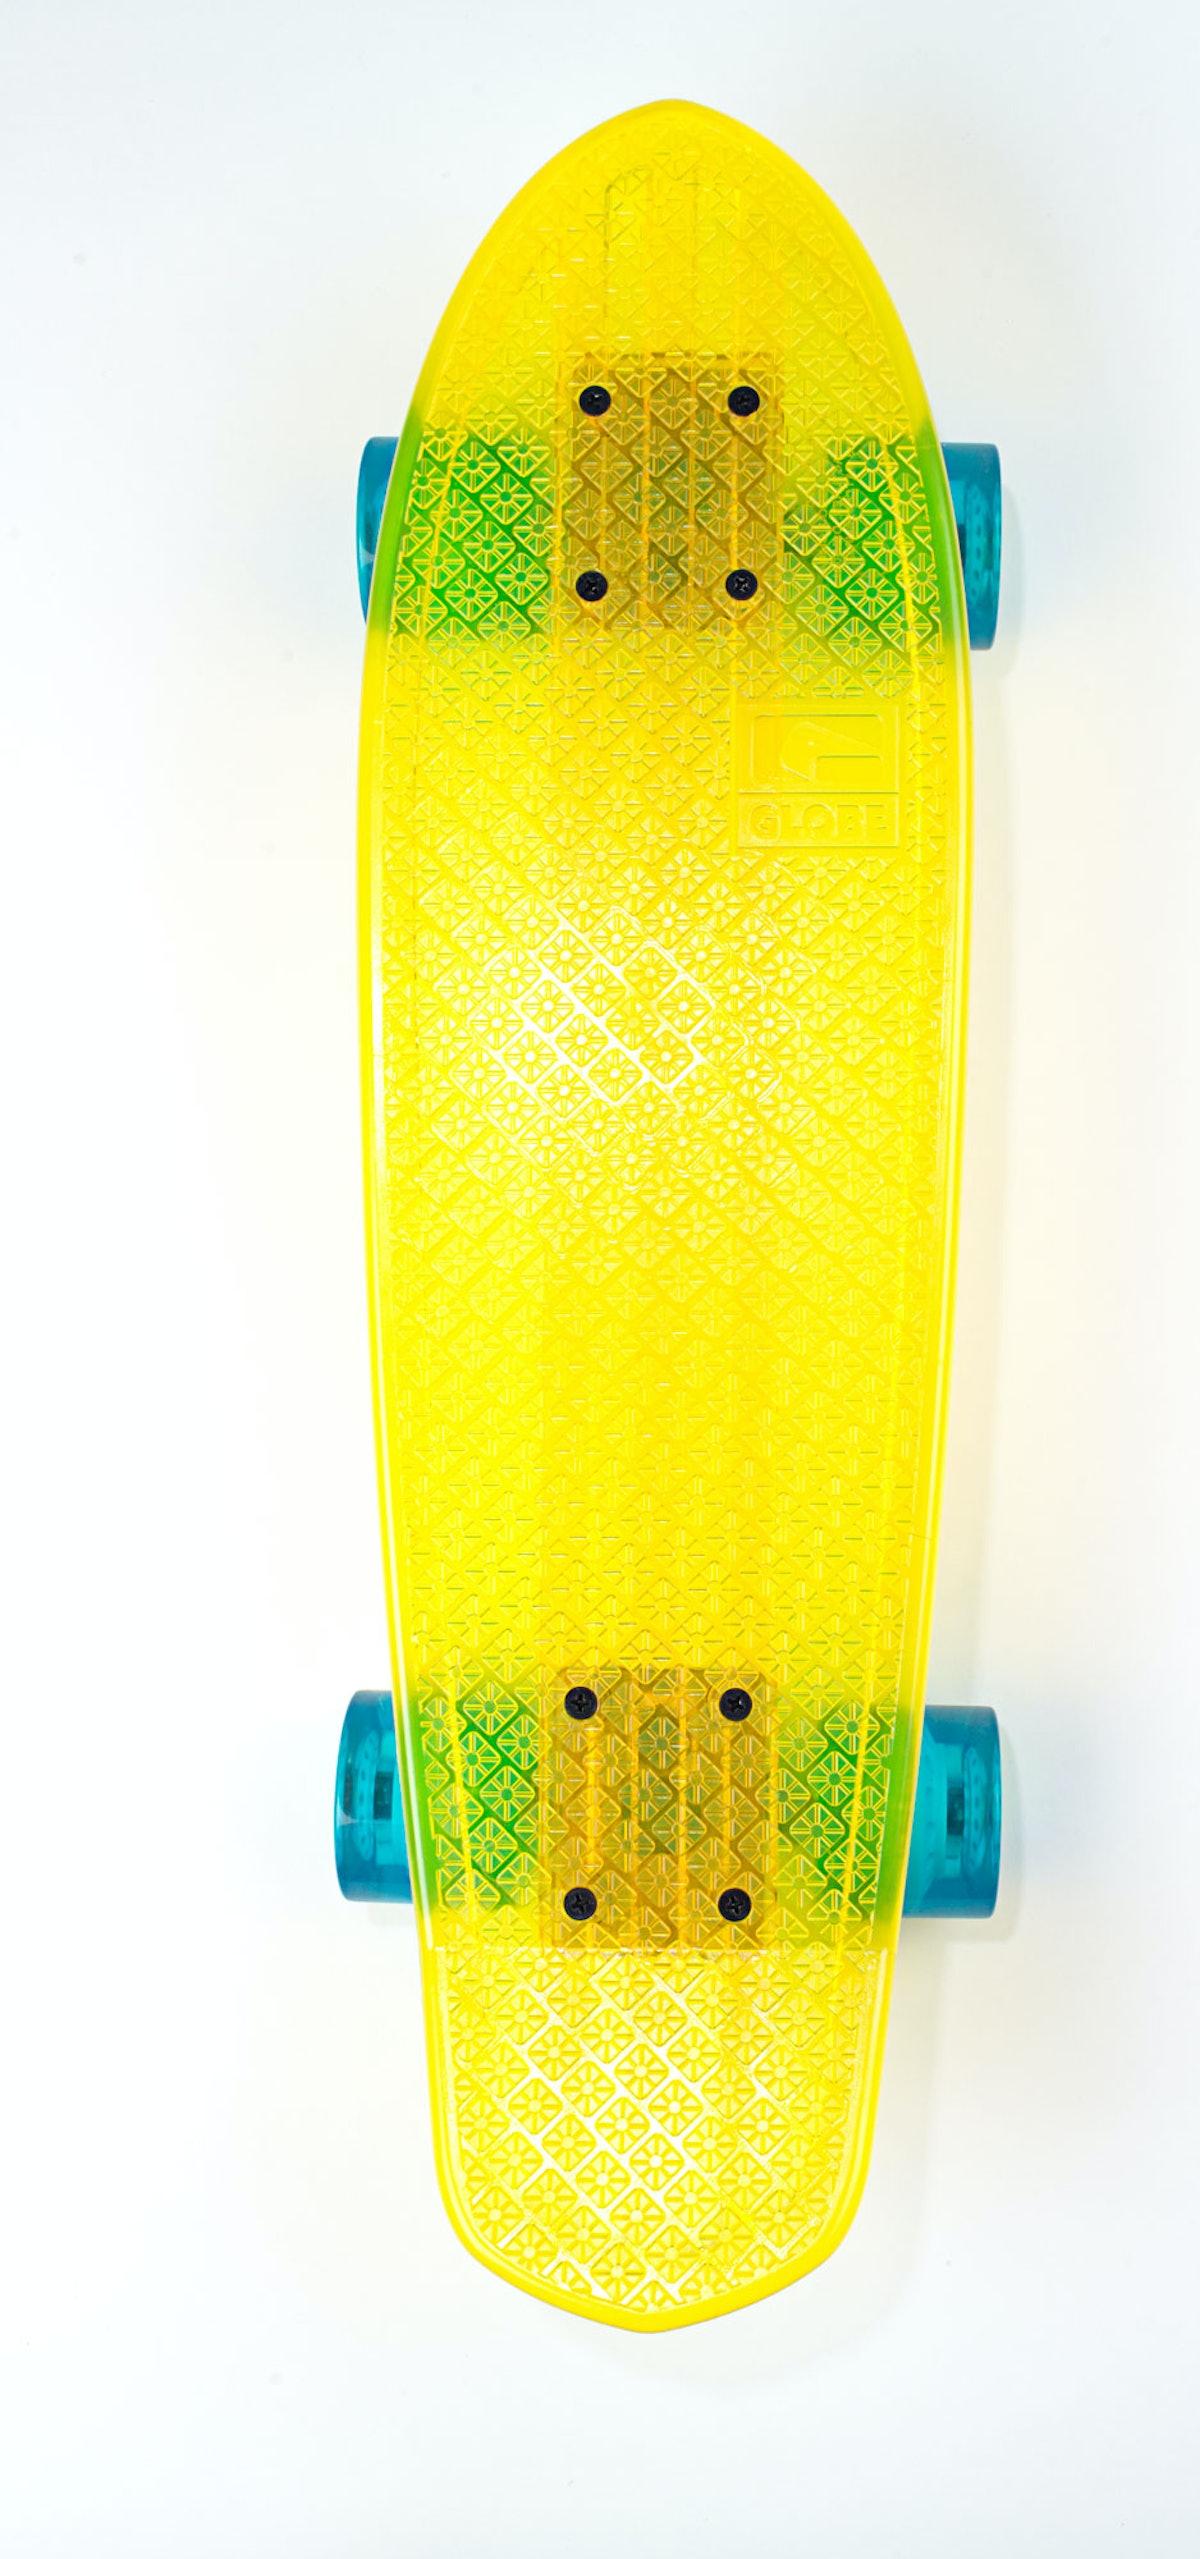 Globe skateboard, $132, [alexandalexa.com](http://alexandalexa.com/).